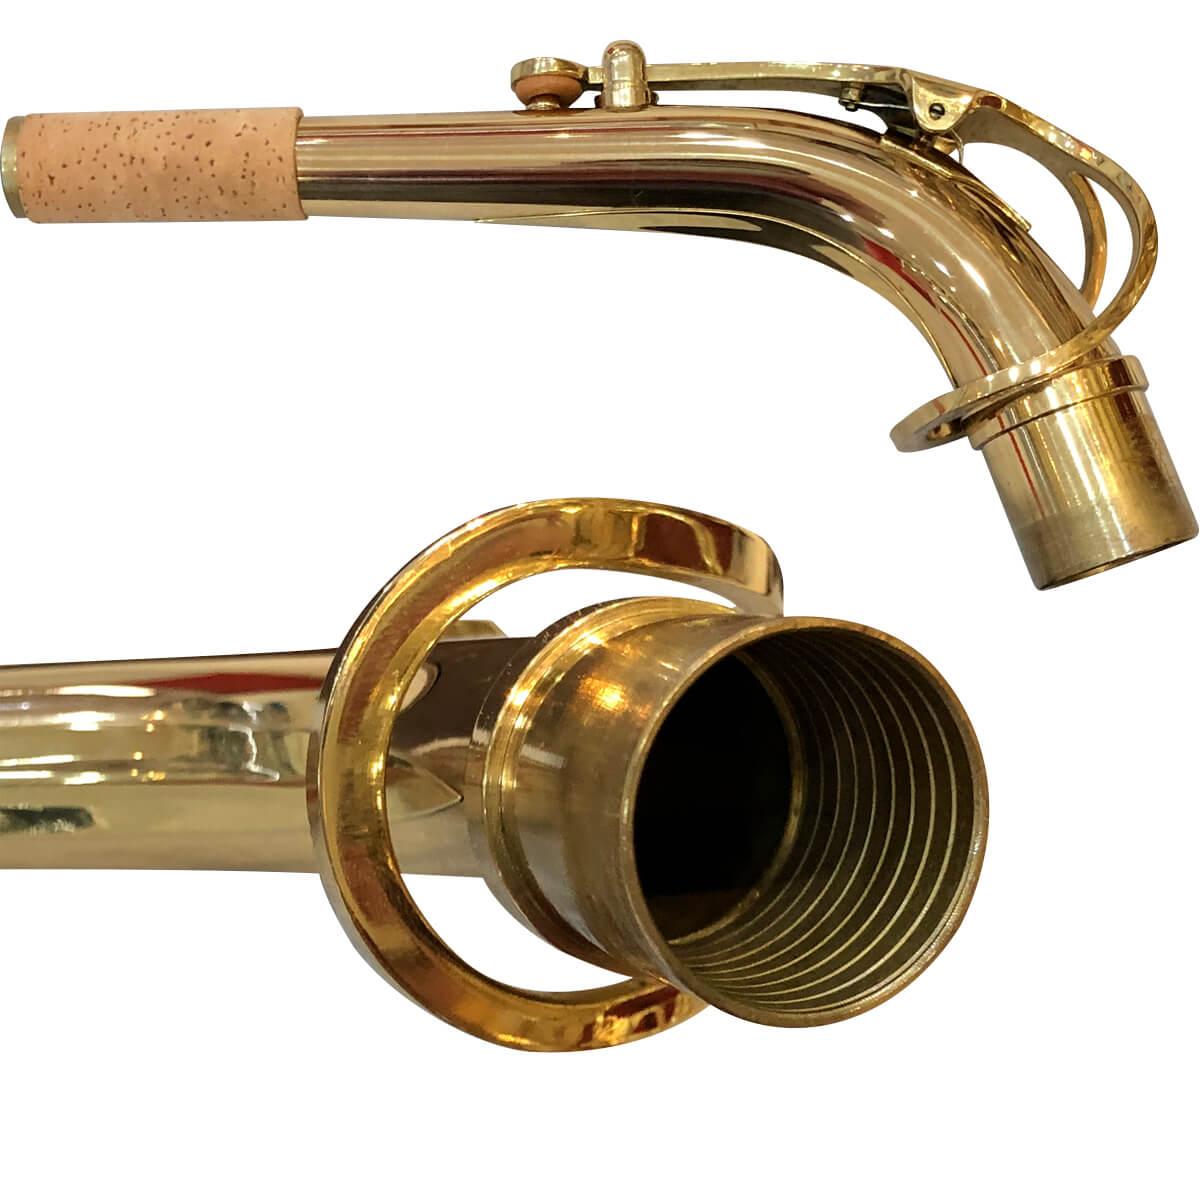 Sax Alto - Dourado - Profissional - Pas-861 - Premier